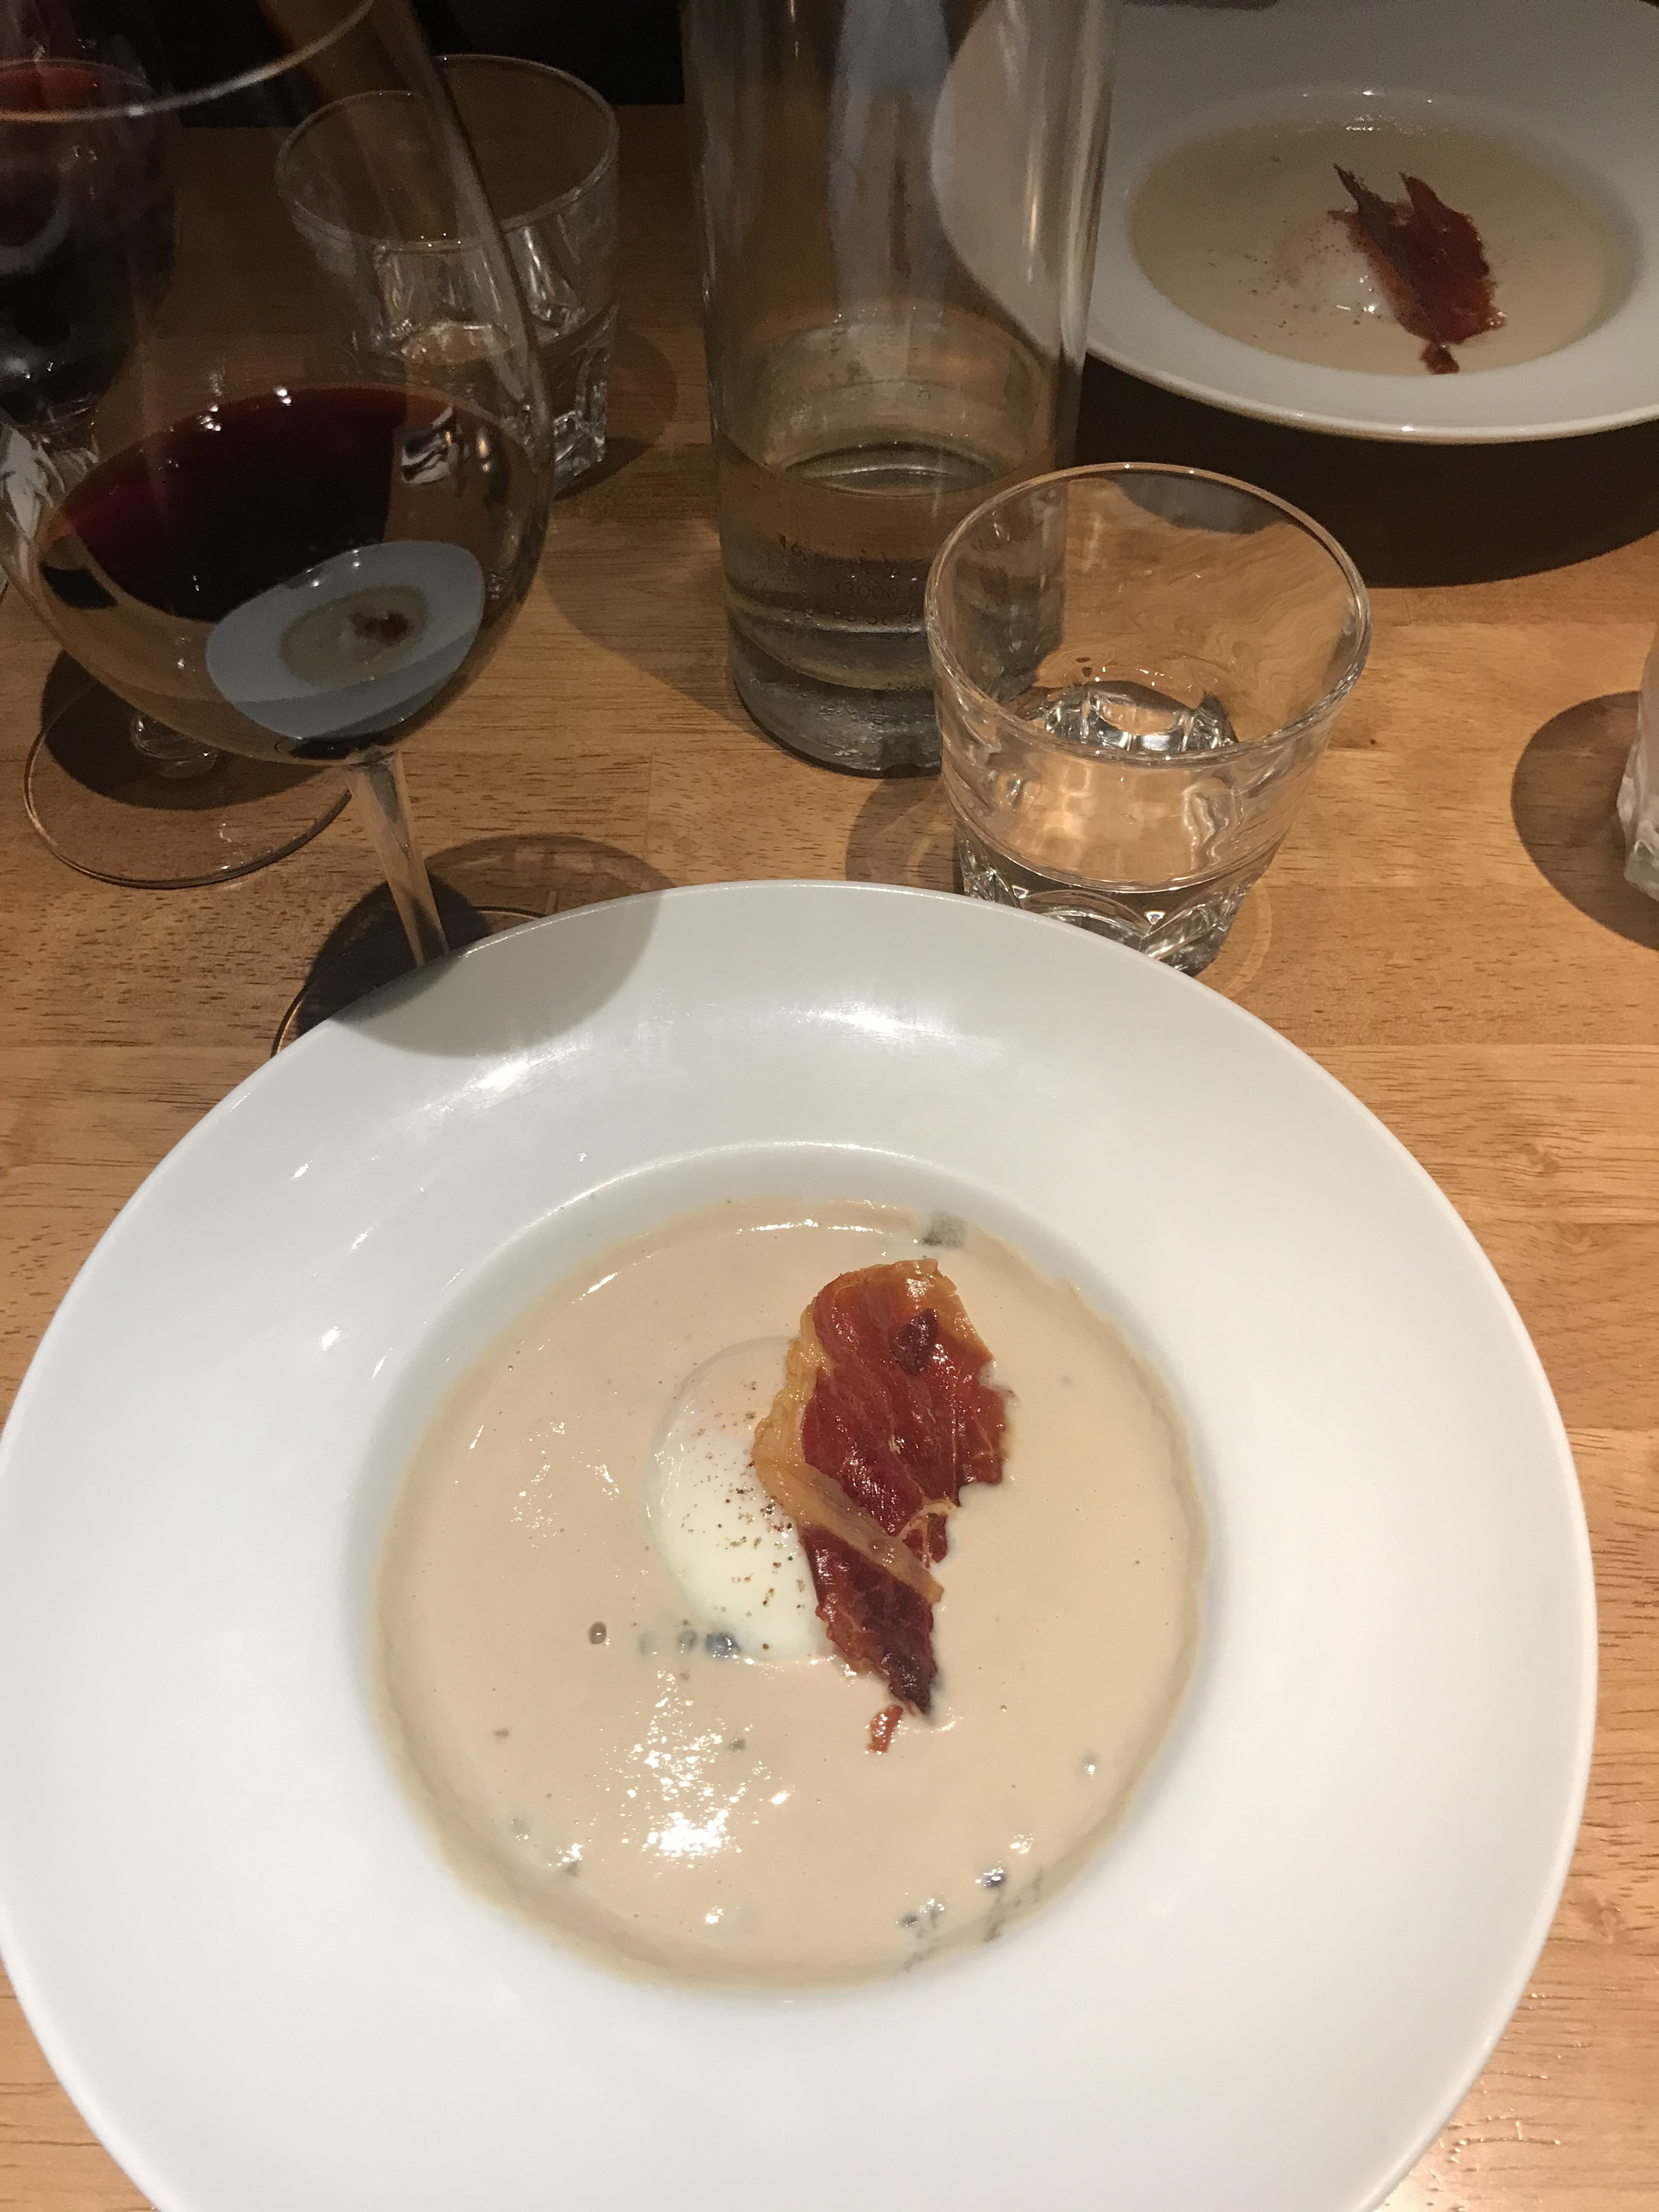 cena-sofisticata-restaurant-loulou-bordeaux-francia